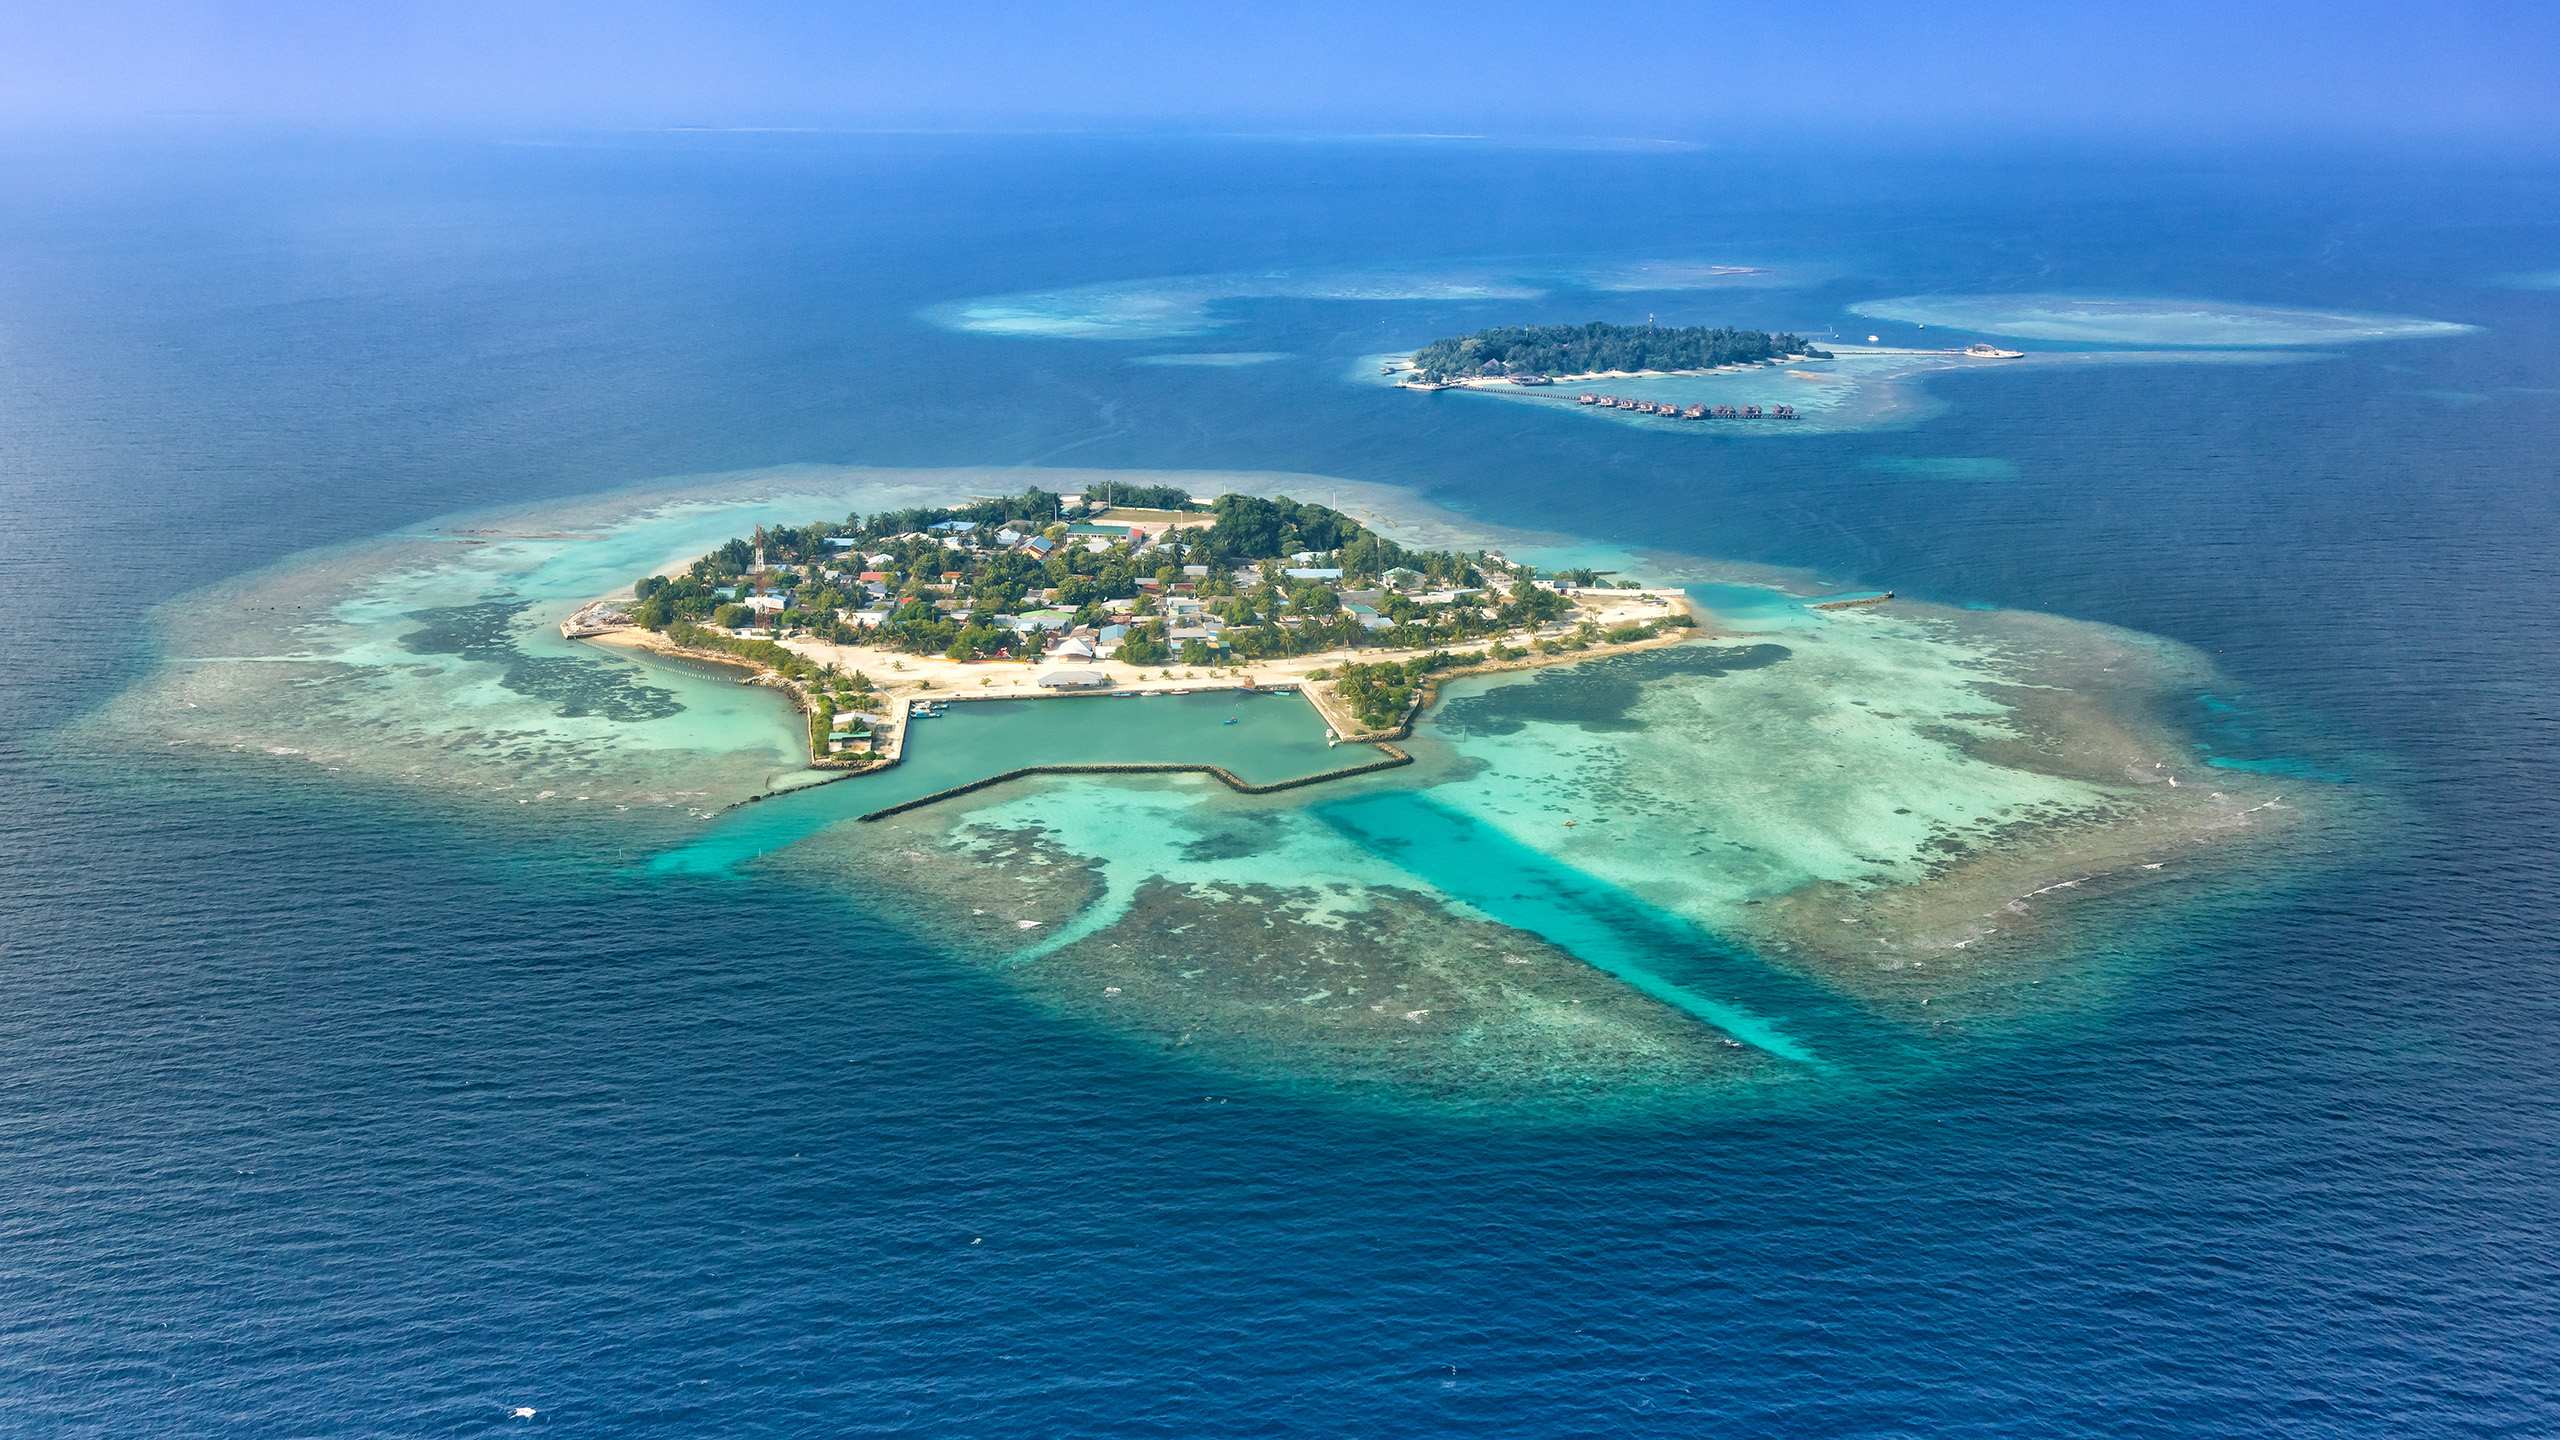 EOMAP Maledives